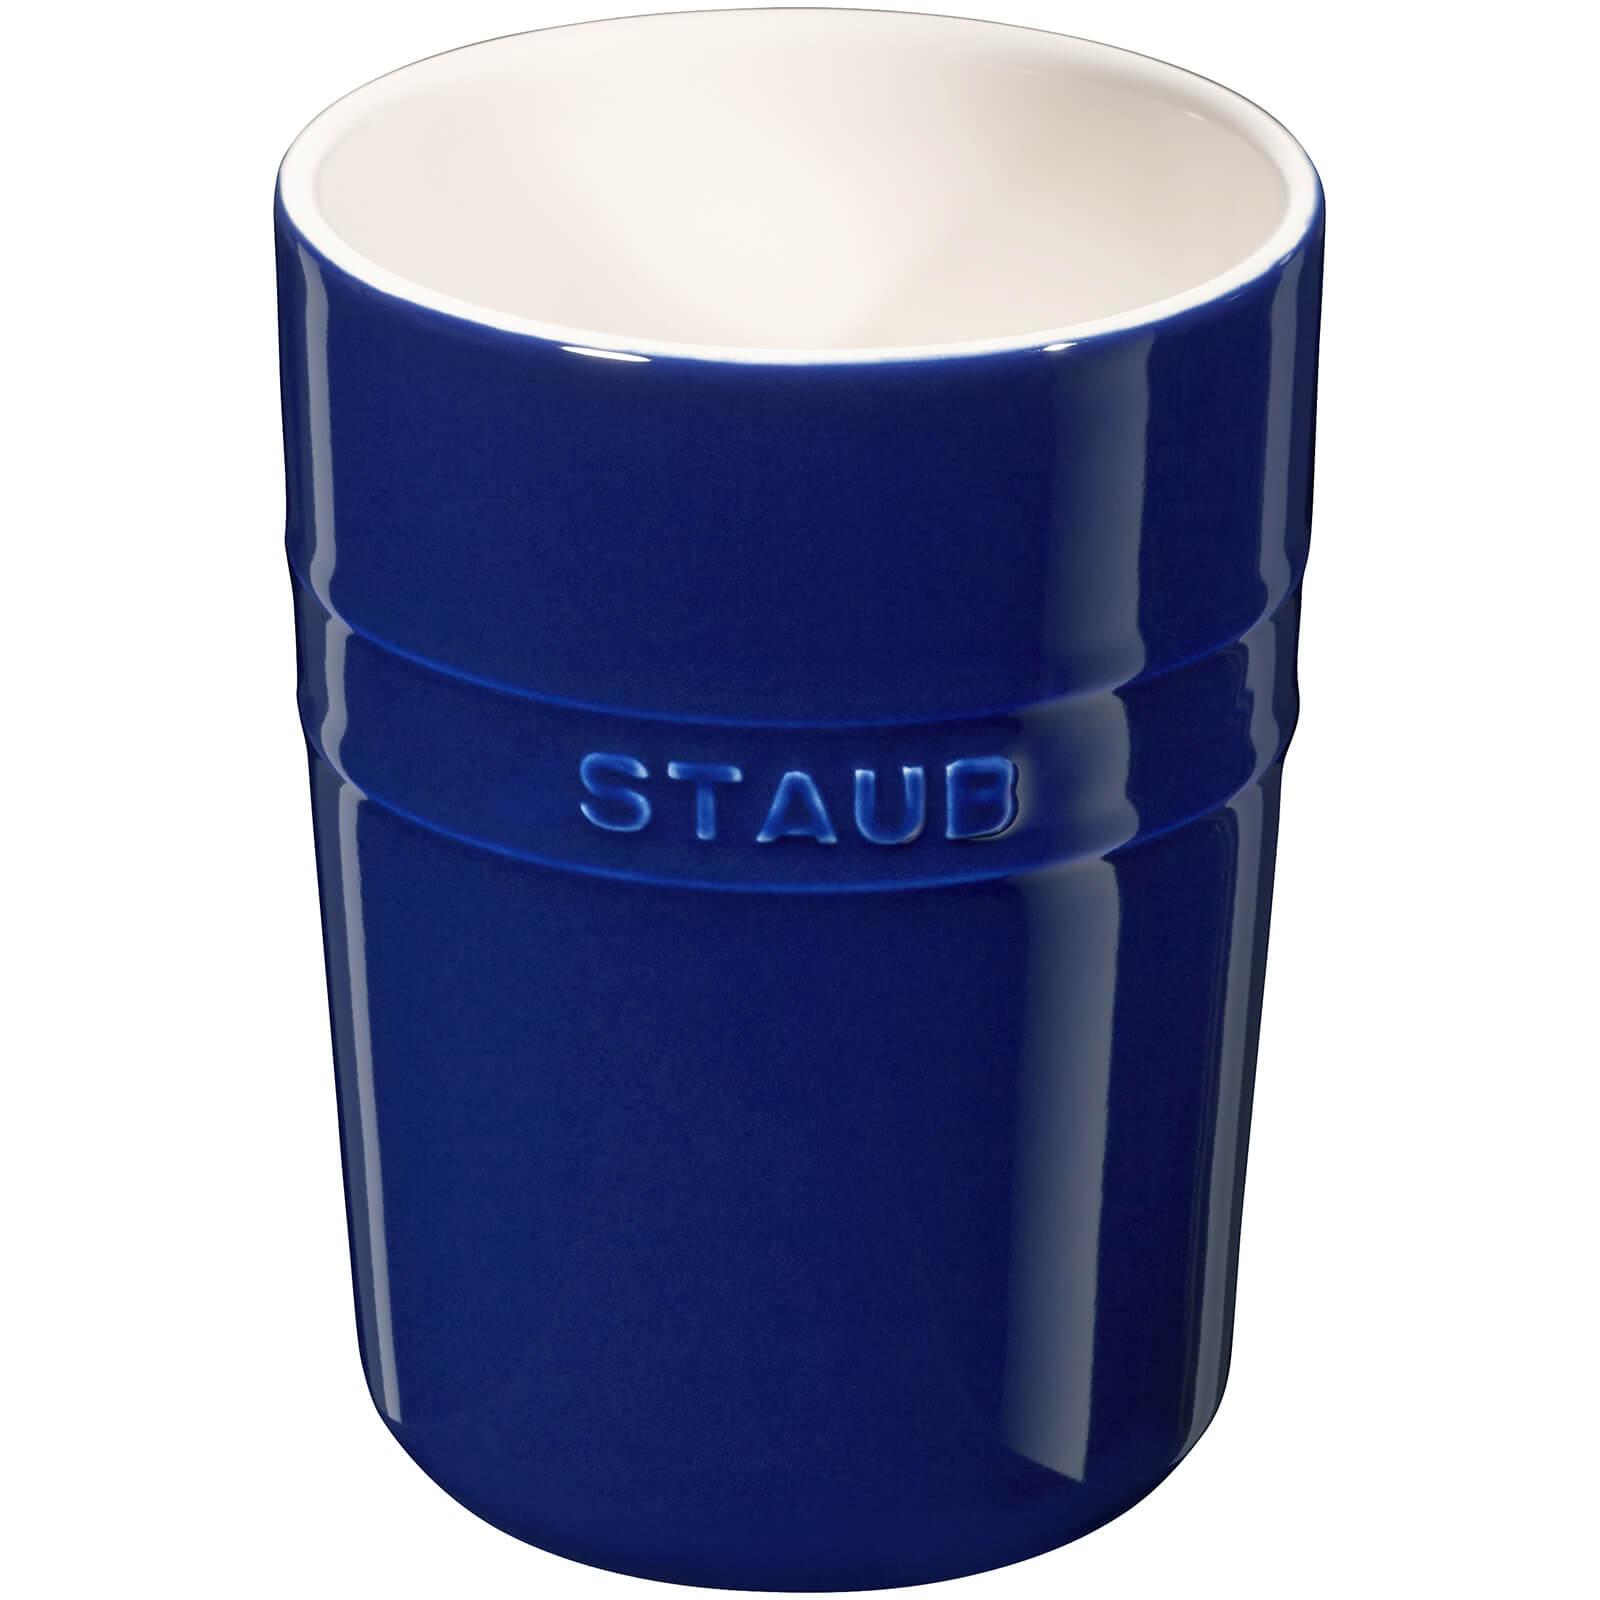 Staub Ceramic Round Utensil Holder - Dark Blue